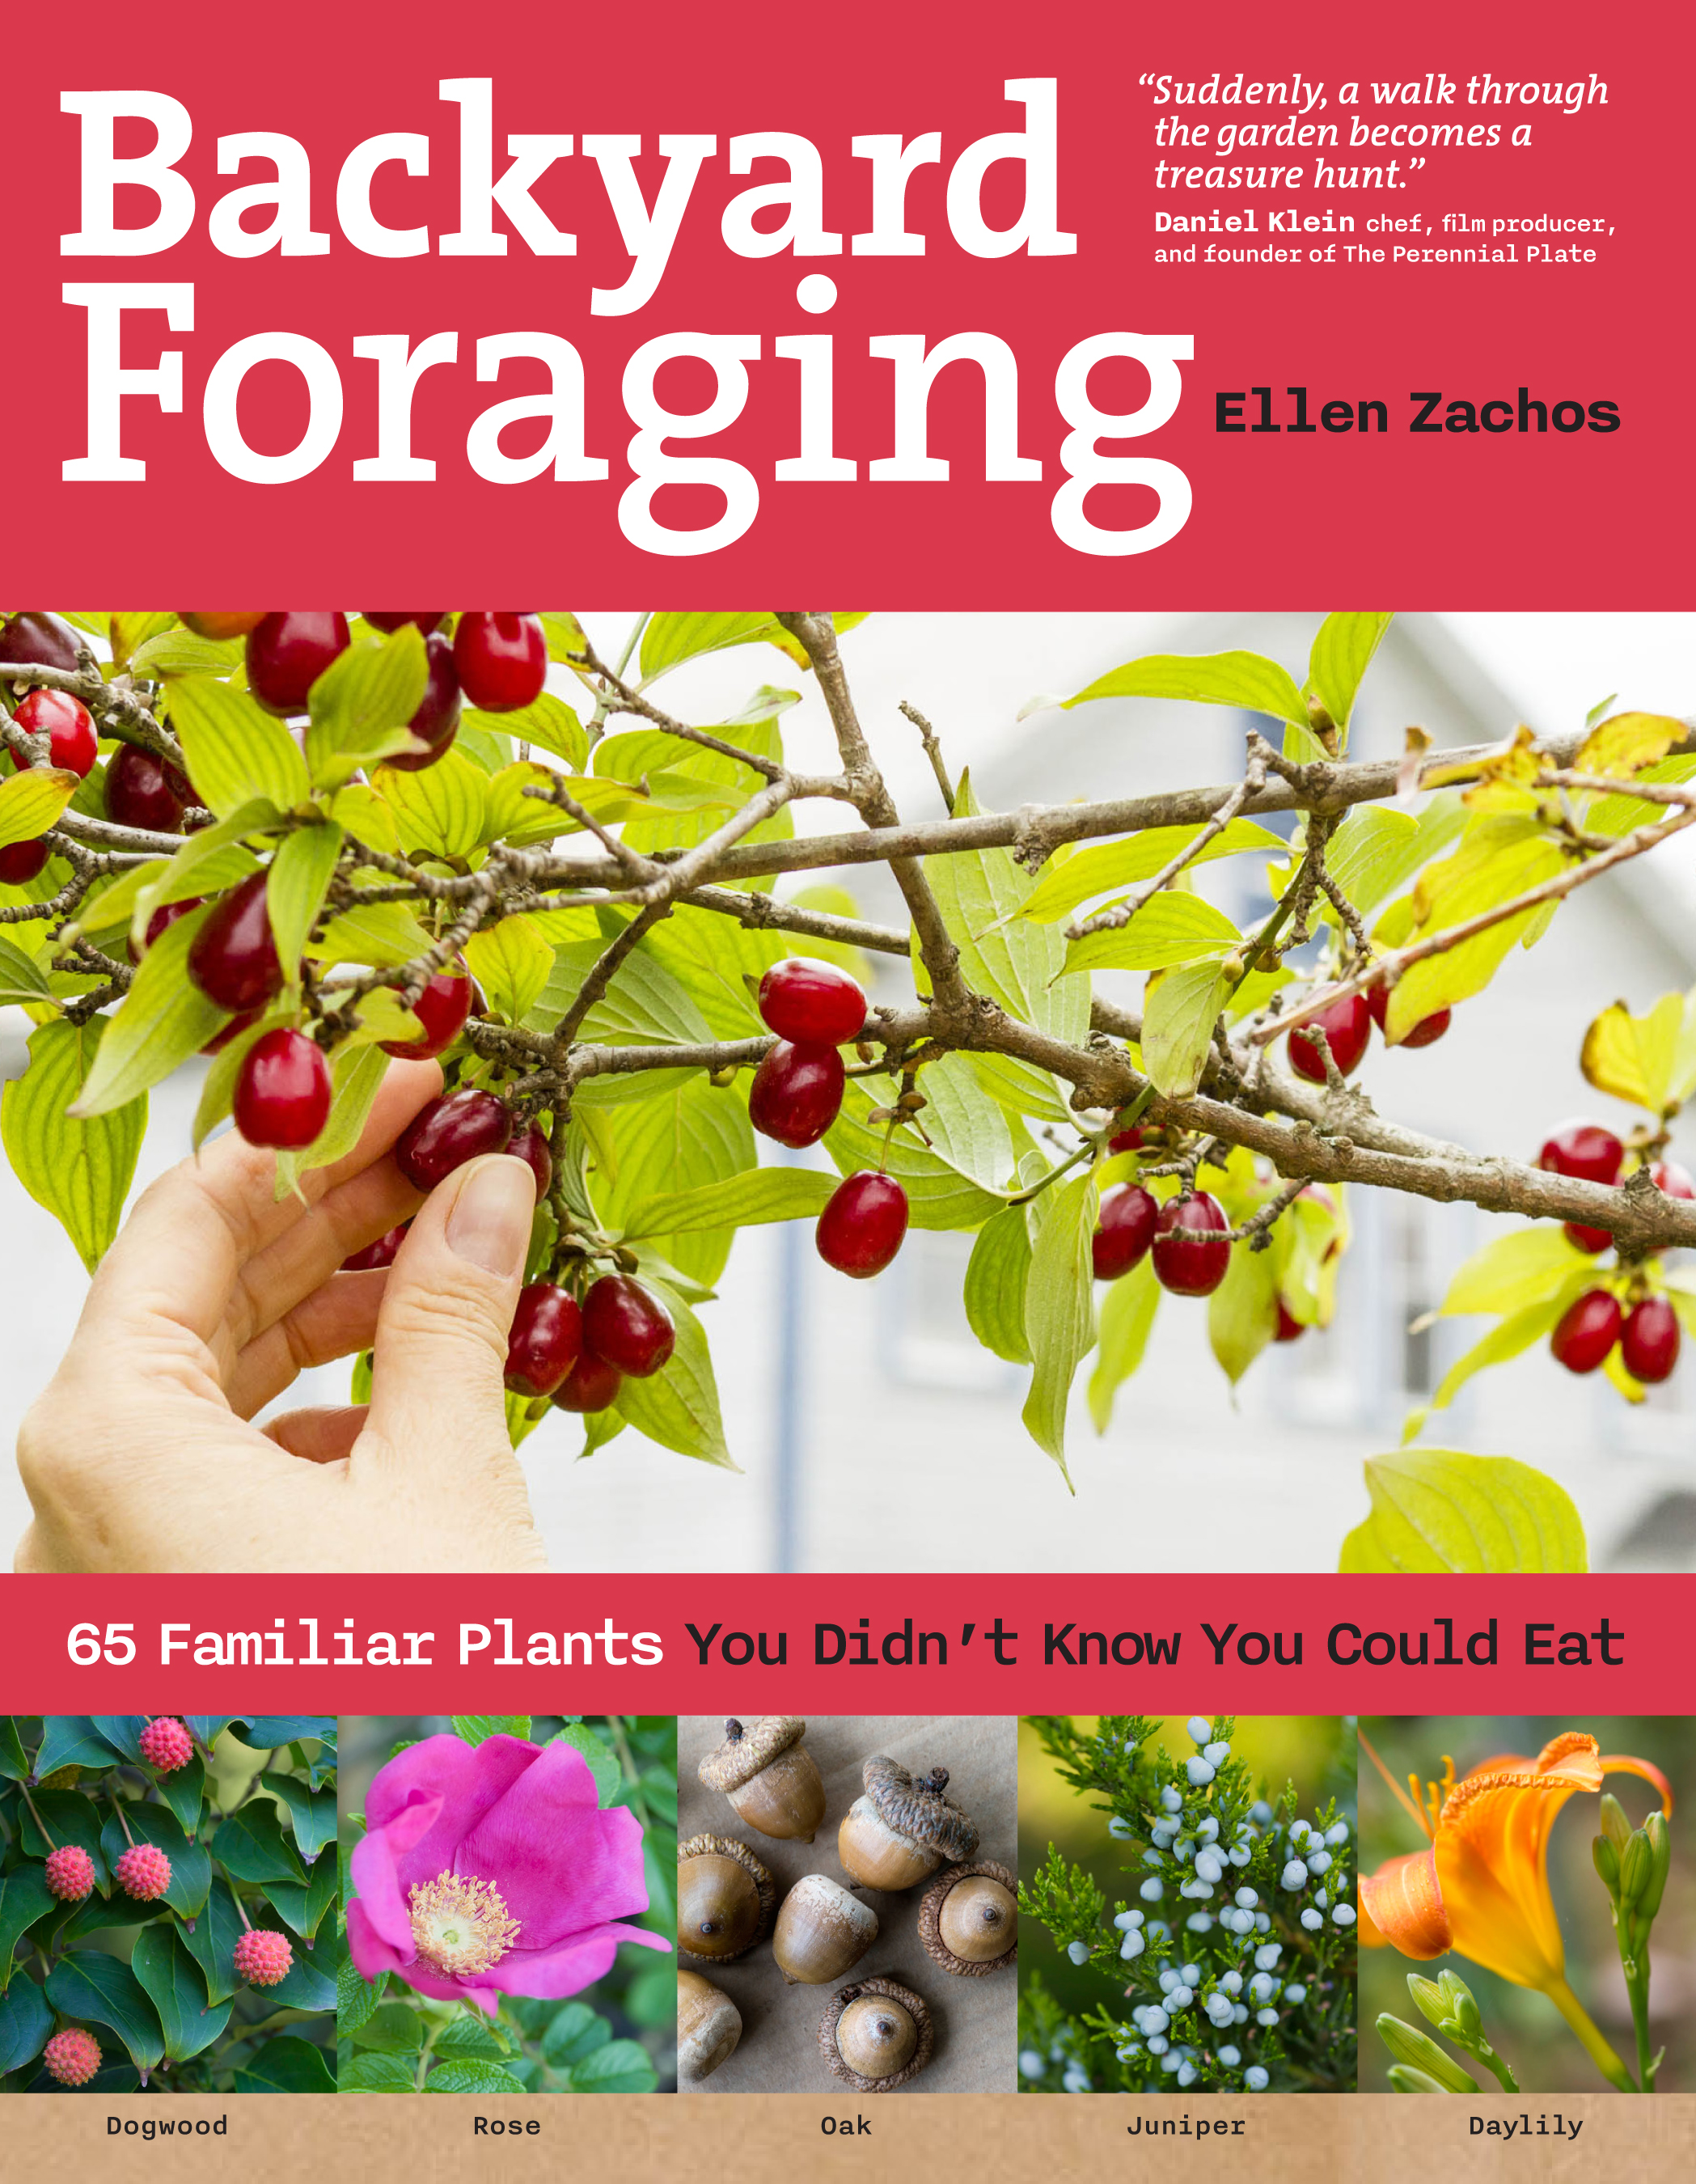 Backyard Foraging 65 Familiar Plants You Didn't Know You Could Eat - Ellen Zachos